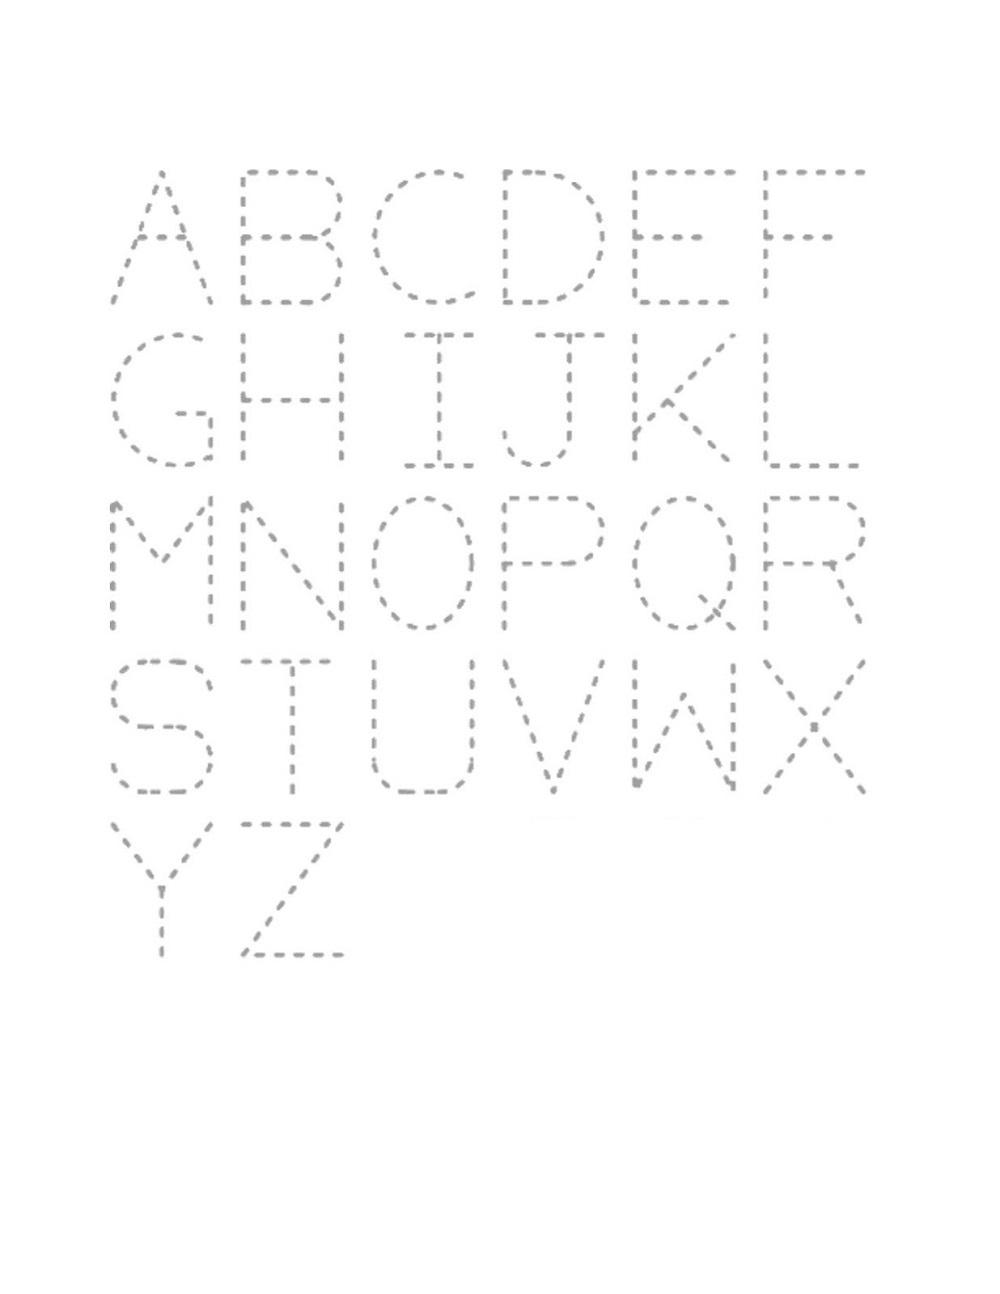 Tracing Worksheets 3 Year Old Fun | Kiddo Shelter | Tracing Worksheets For 3 Year Olds Printable